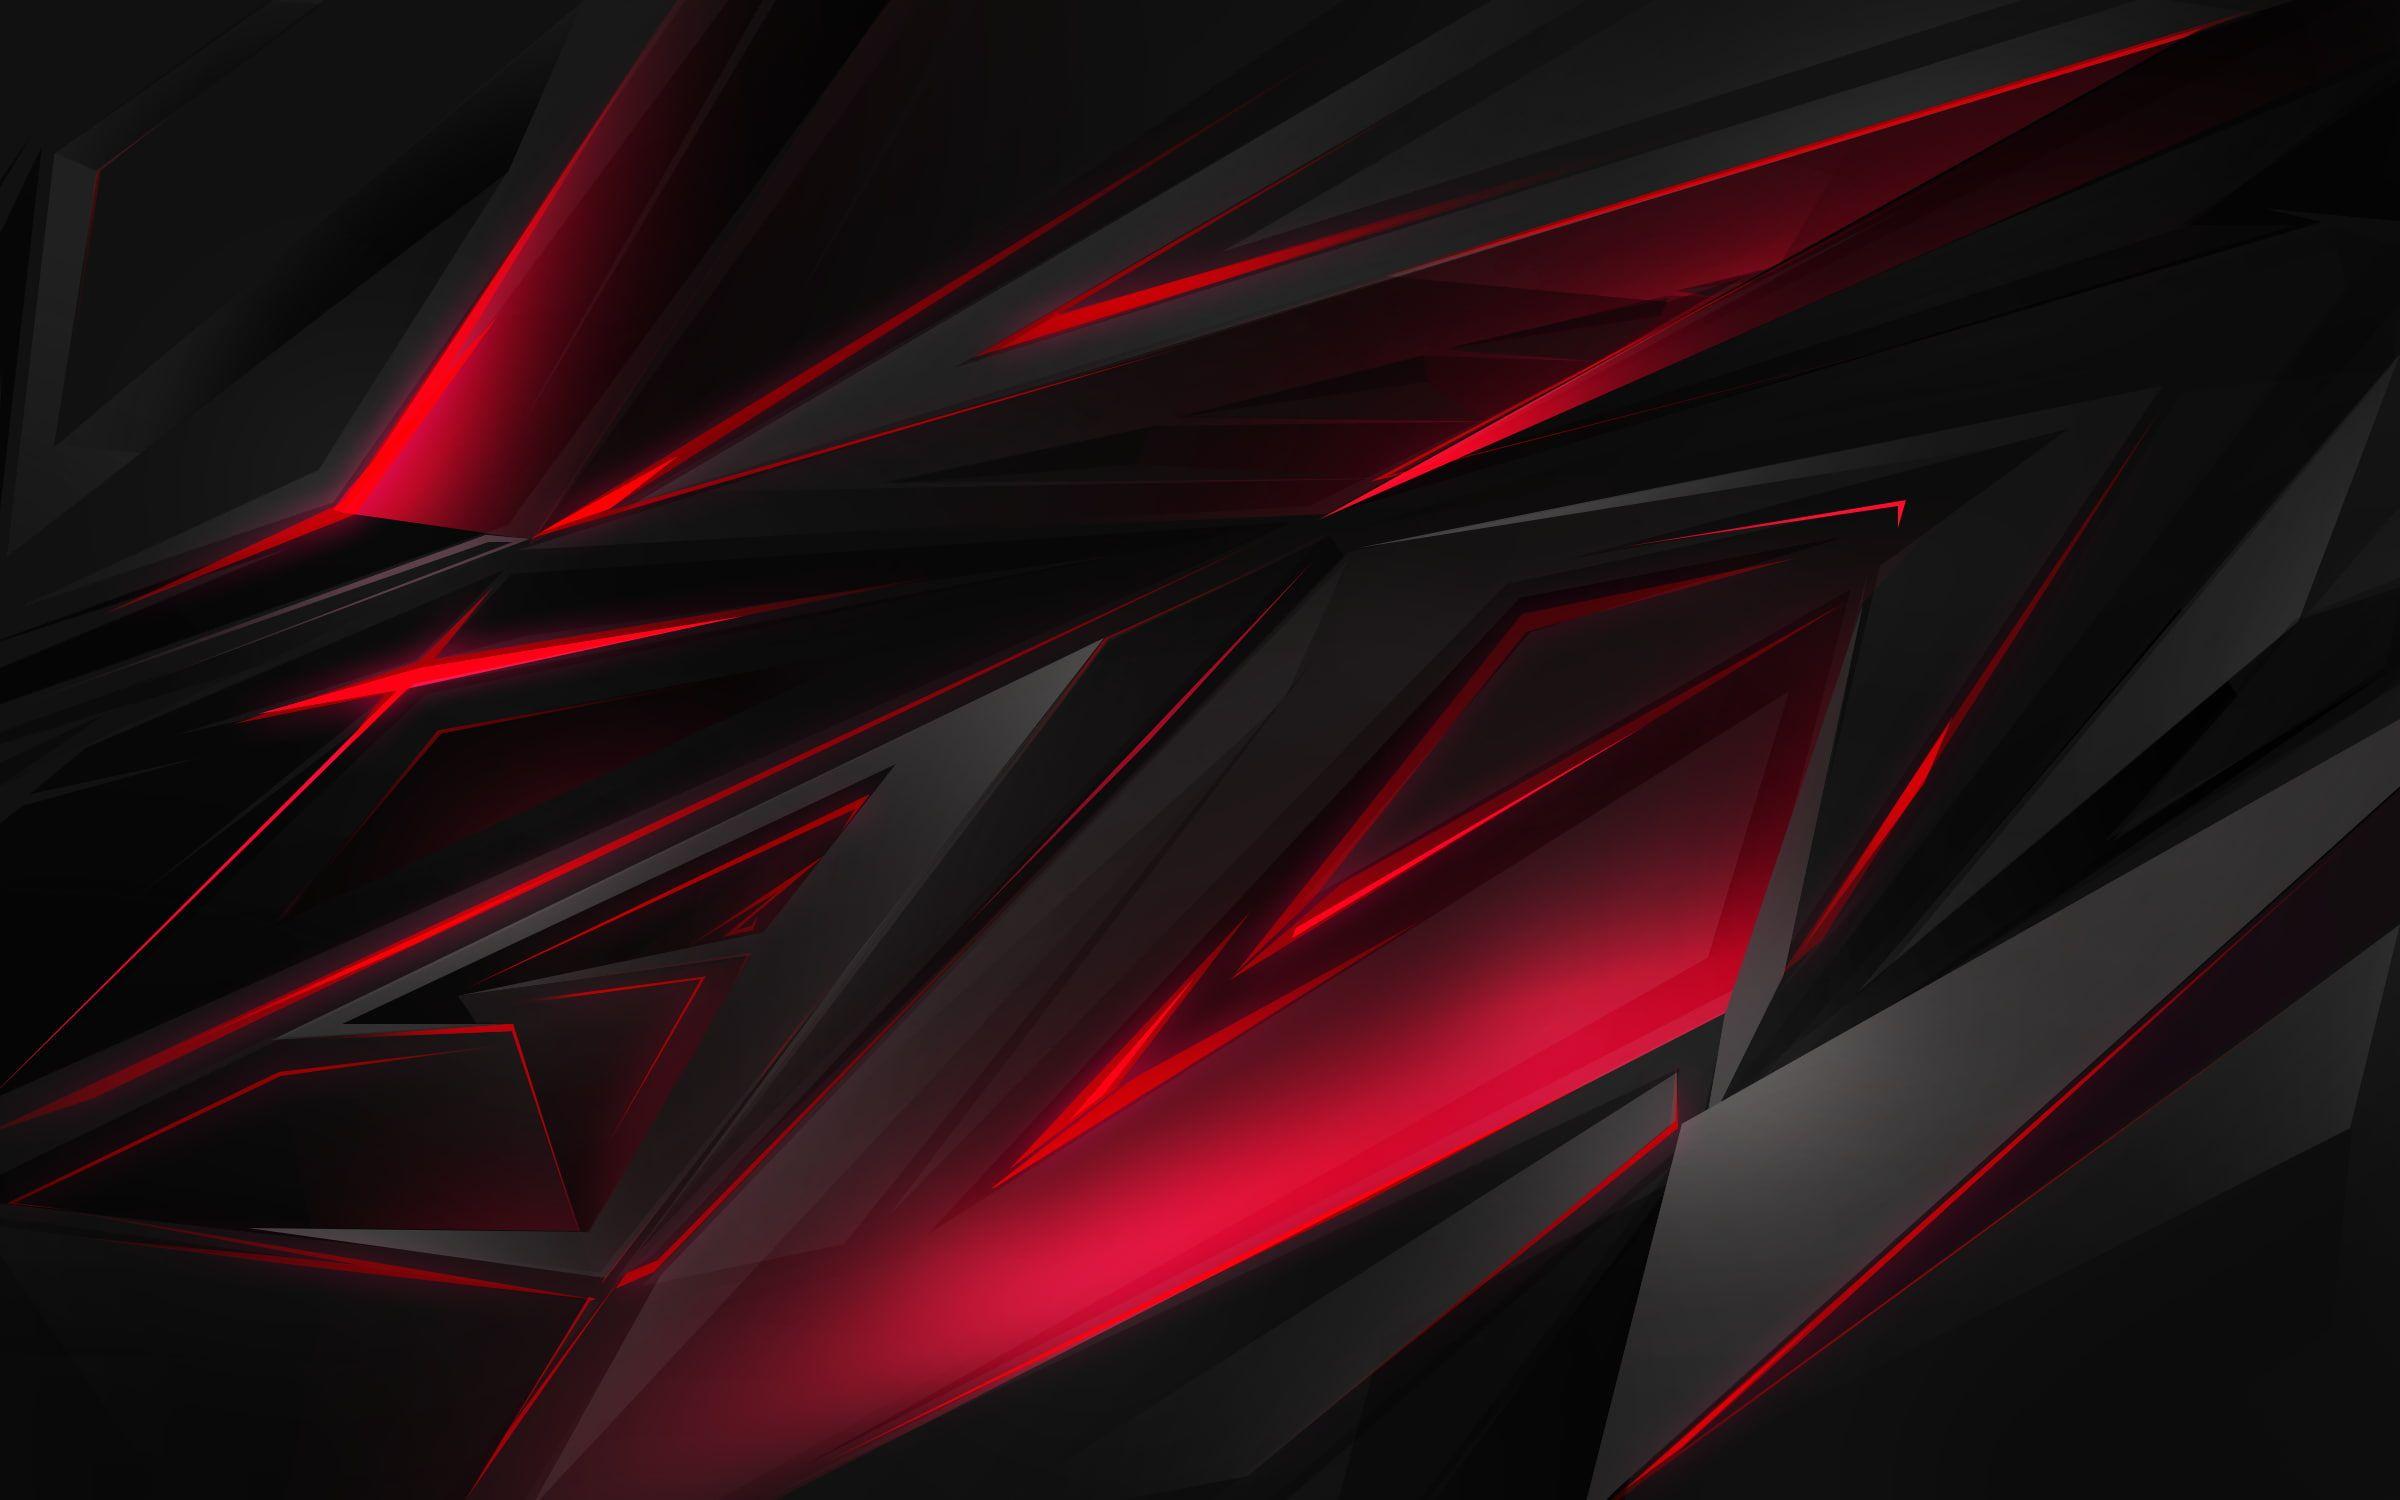 Wallpaper Abstract 3d Digital Art Dark Red Black Backgrounds No People Karya Seni 3d Abstrak Gelap